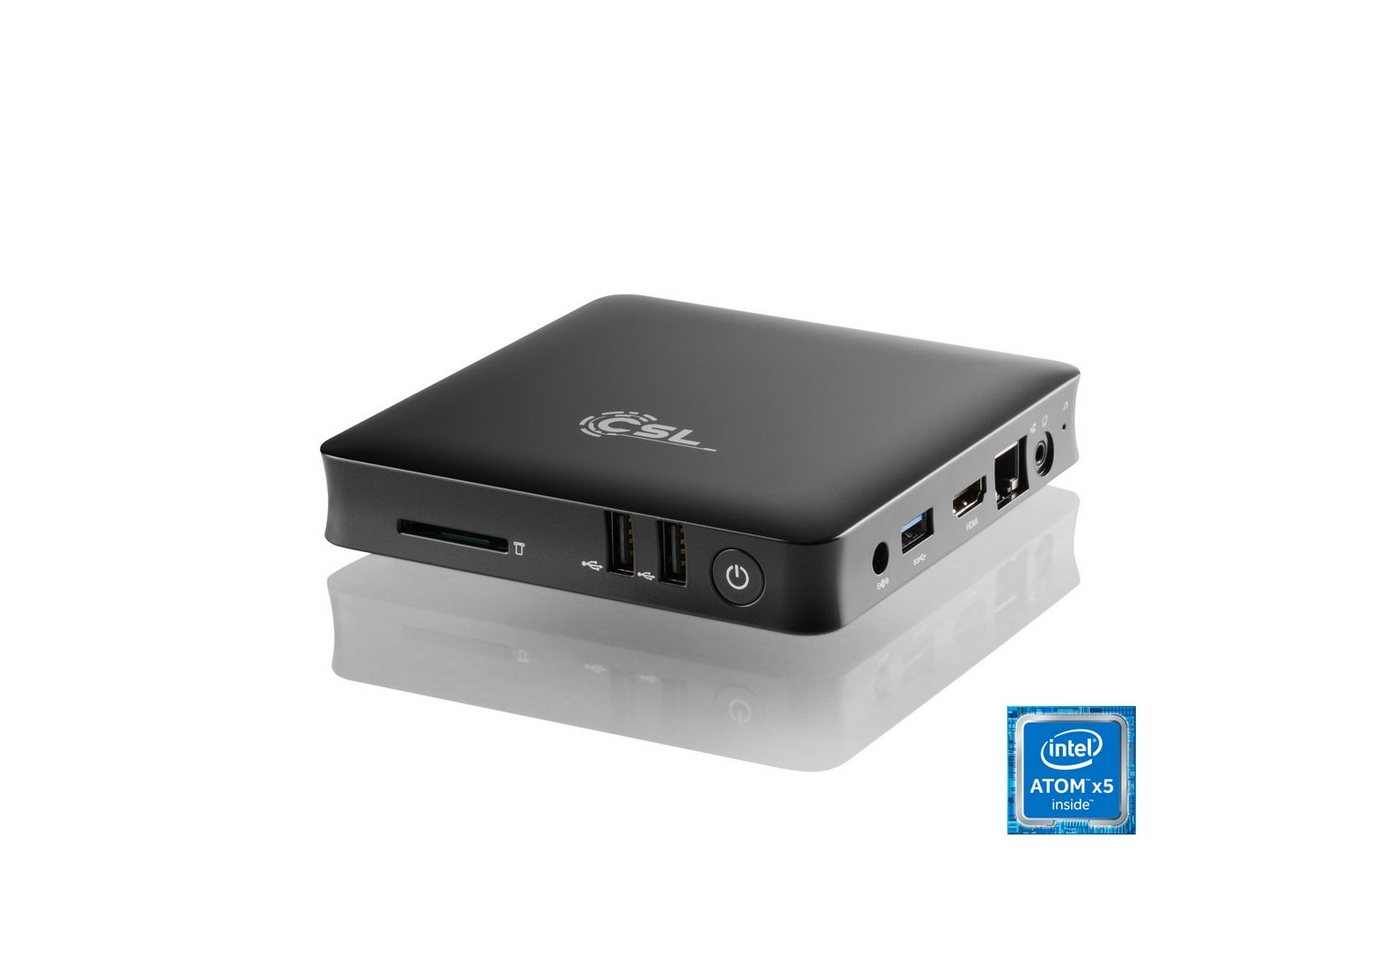 CSL Silent Mini PC - lautlos, TV, Bluetooth, WLAN »Narrow Box 4K, 4GB RAM, Windows 10, USB 3.1«